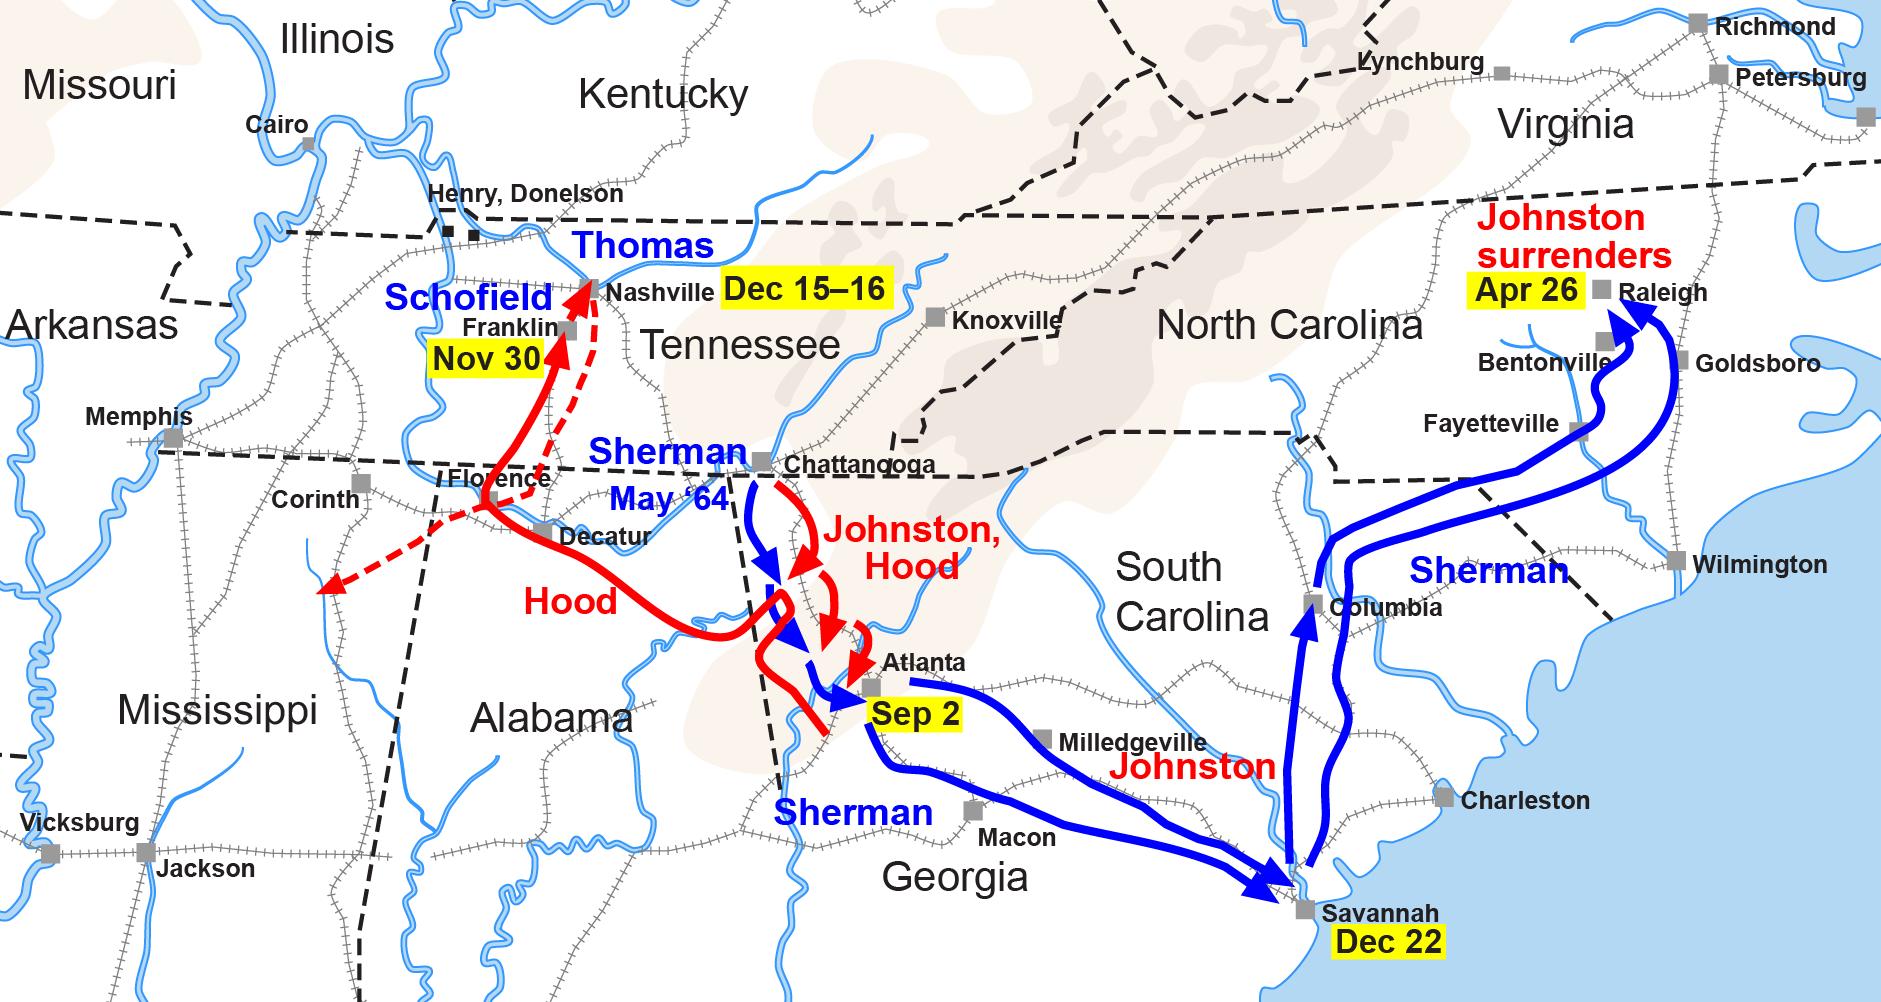 FileACW ChattanoogaCarolinaspng Wikimedia Commons - Georgia map fayetteville